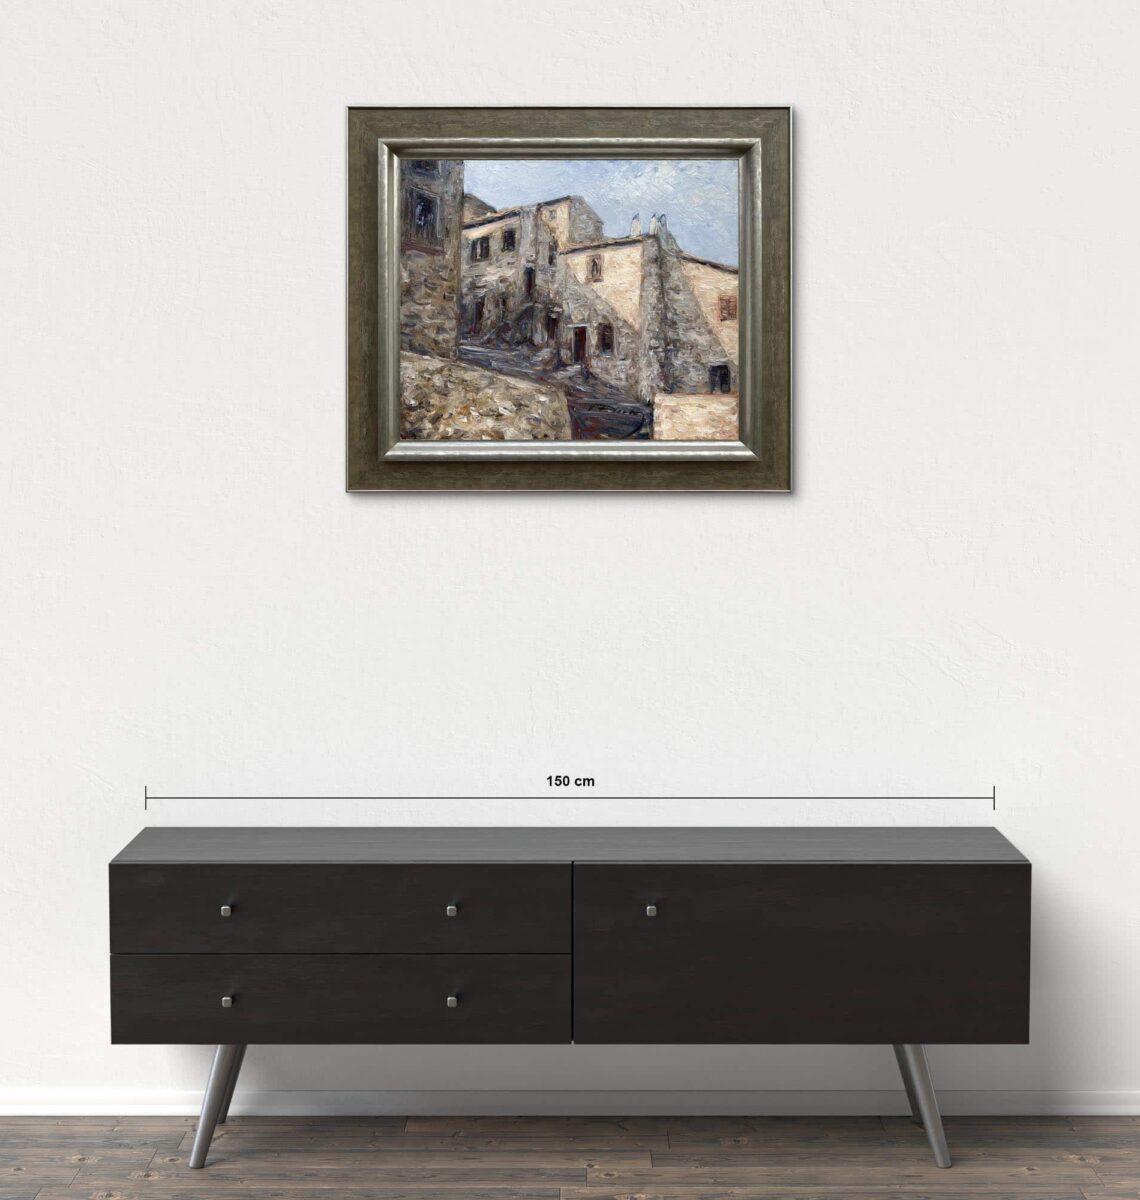 Názov: Alviano / Rozmery: 50x60 cm / Rok: 2007 / Technika: Olejomaľba